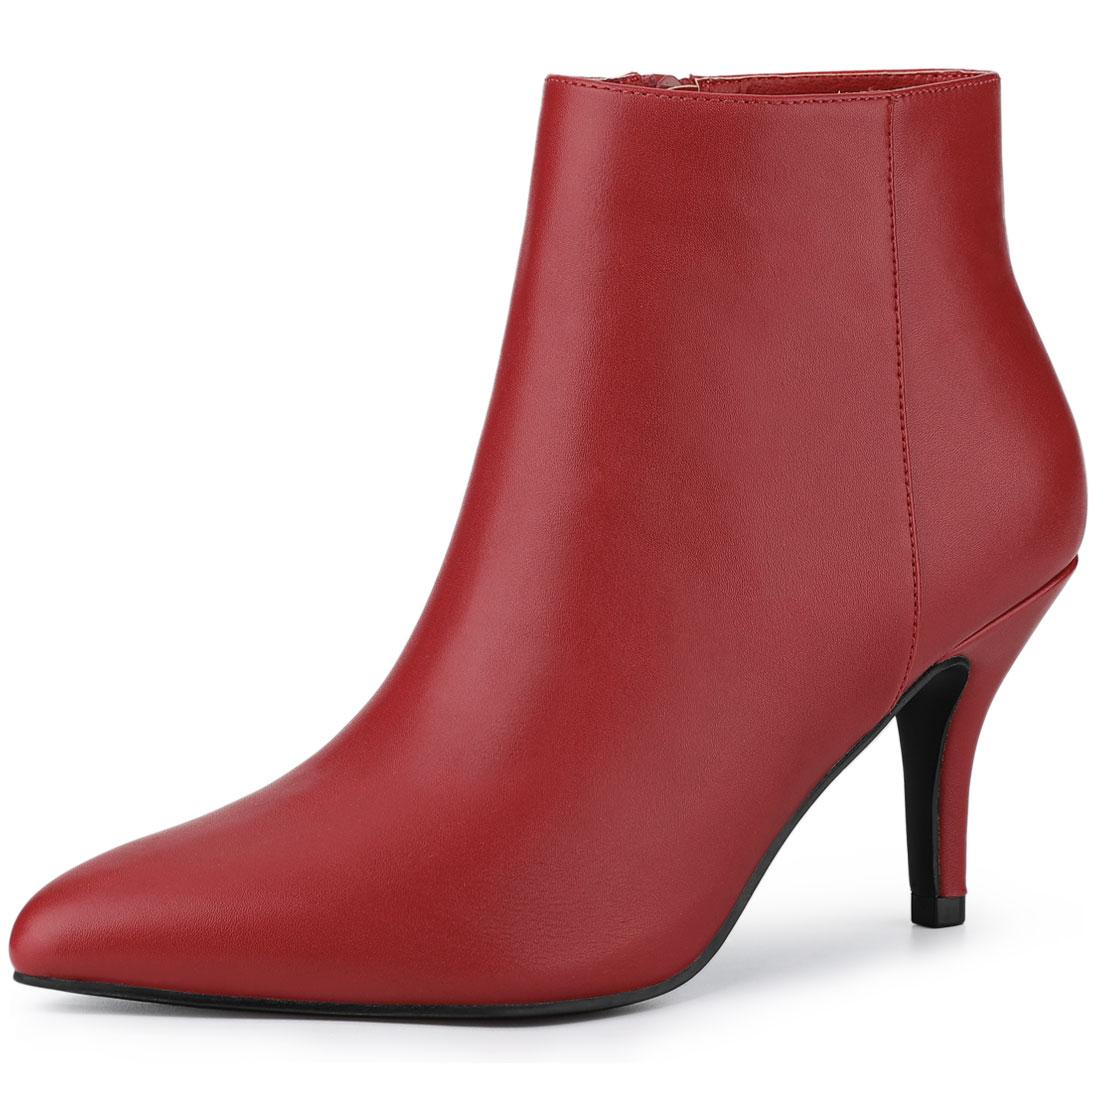 Allegra K Women's Pointed Toe Zipper Stiletto Heel Ankle Boots Red US 9